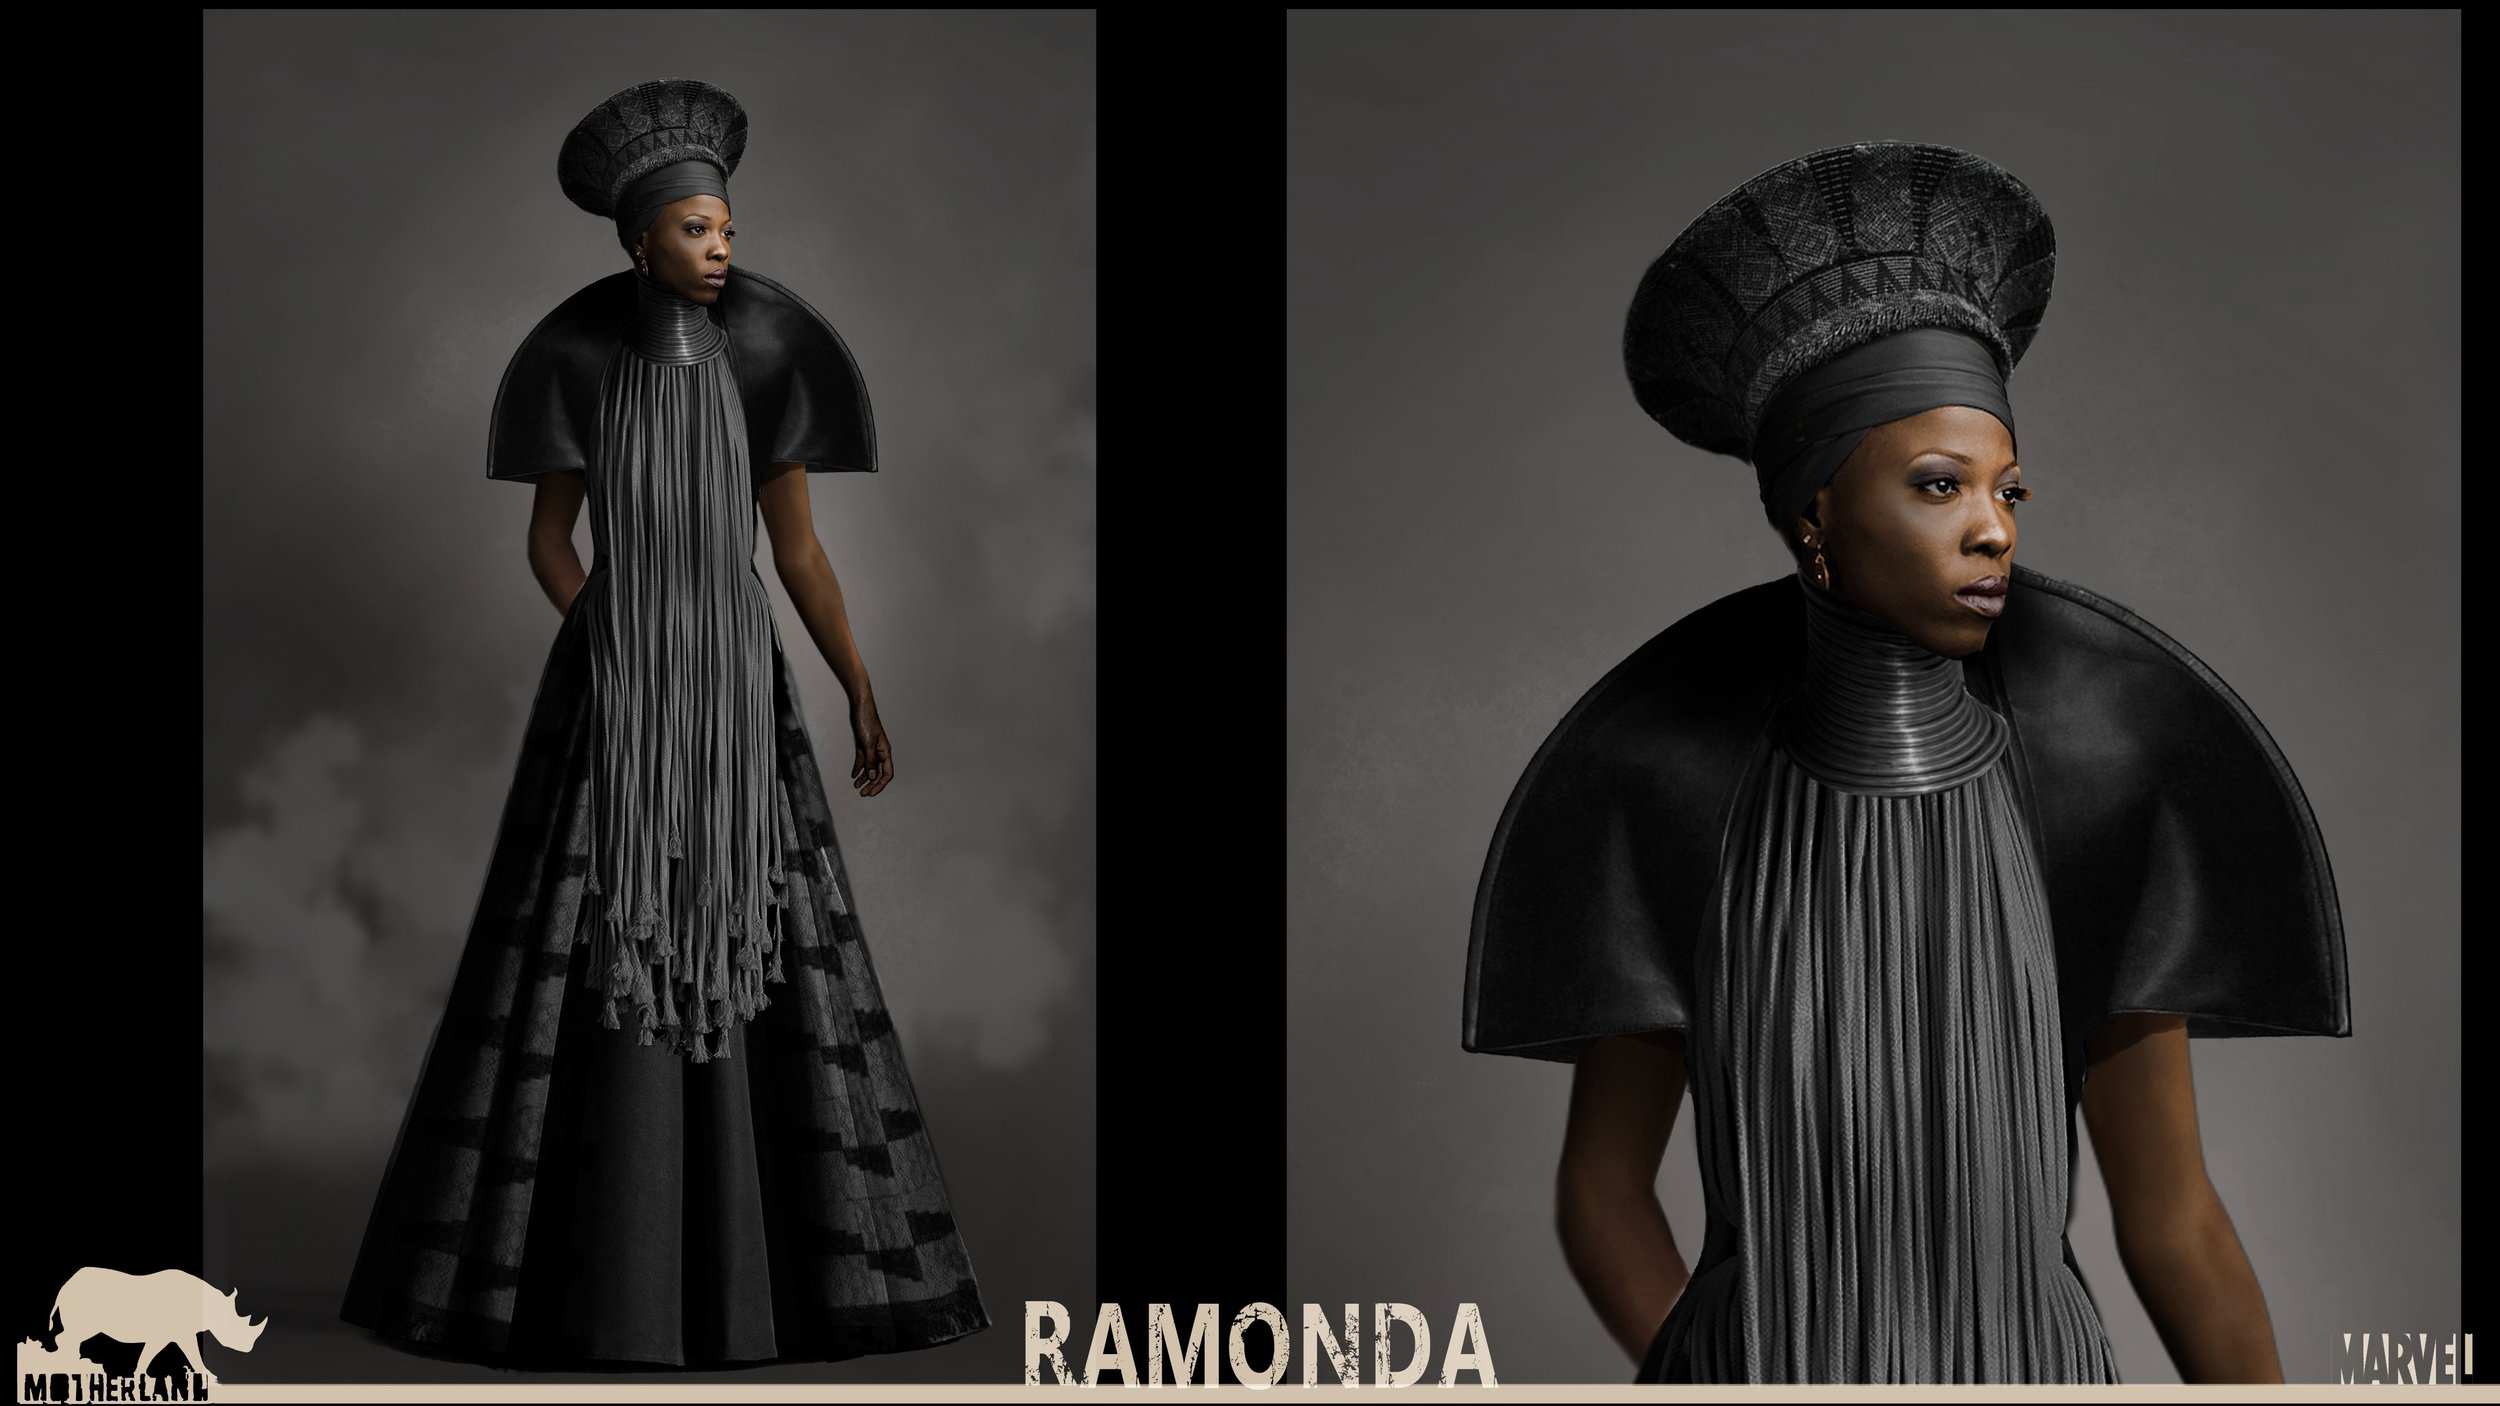 024-006-RAMONDA-02.jpg